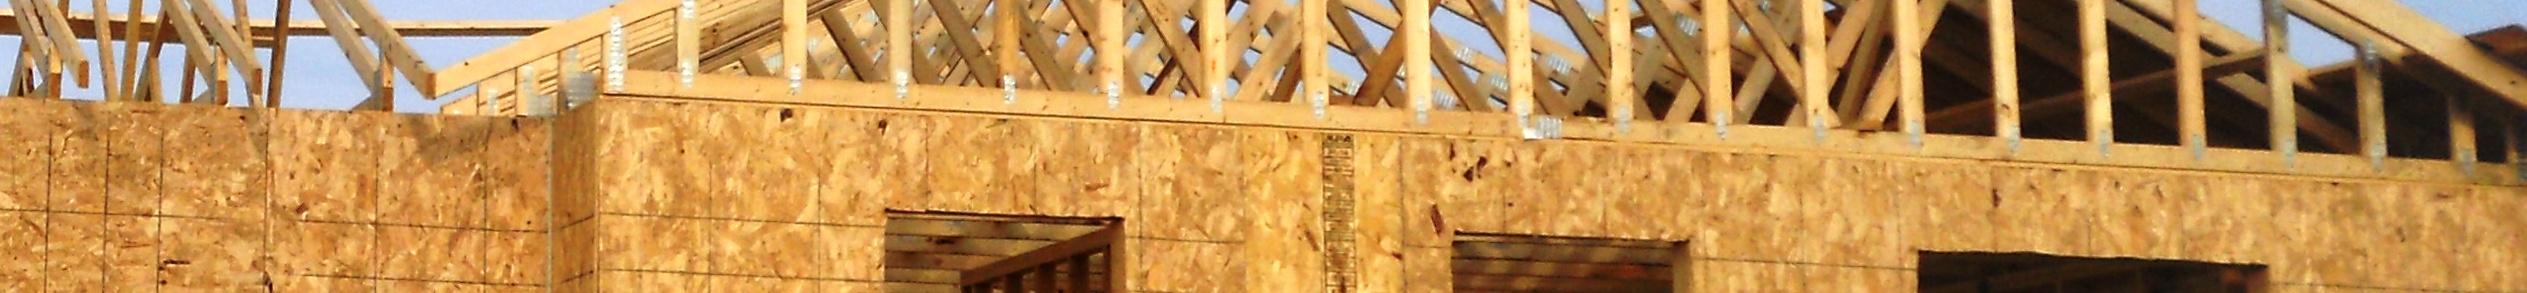 Frank Duffy Build June 20, 2013